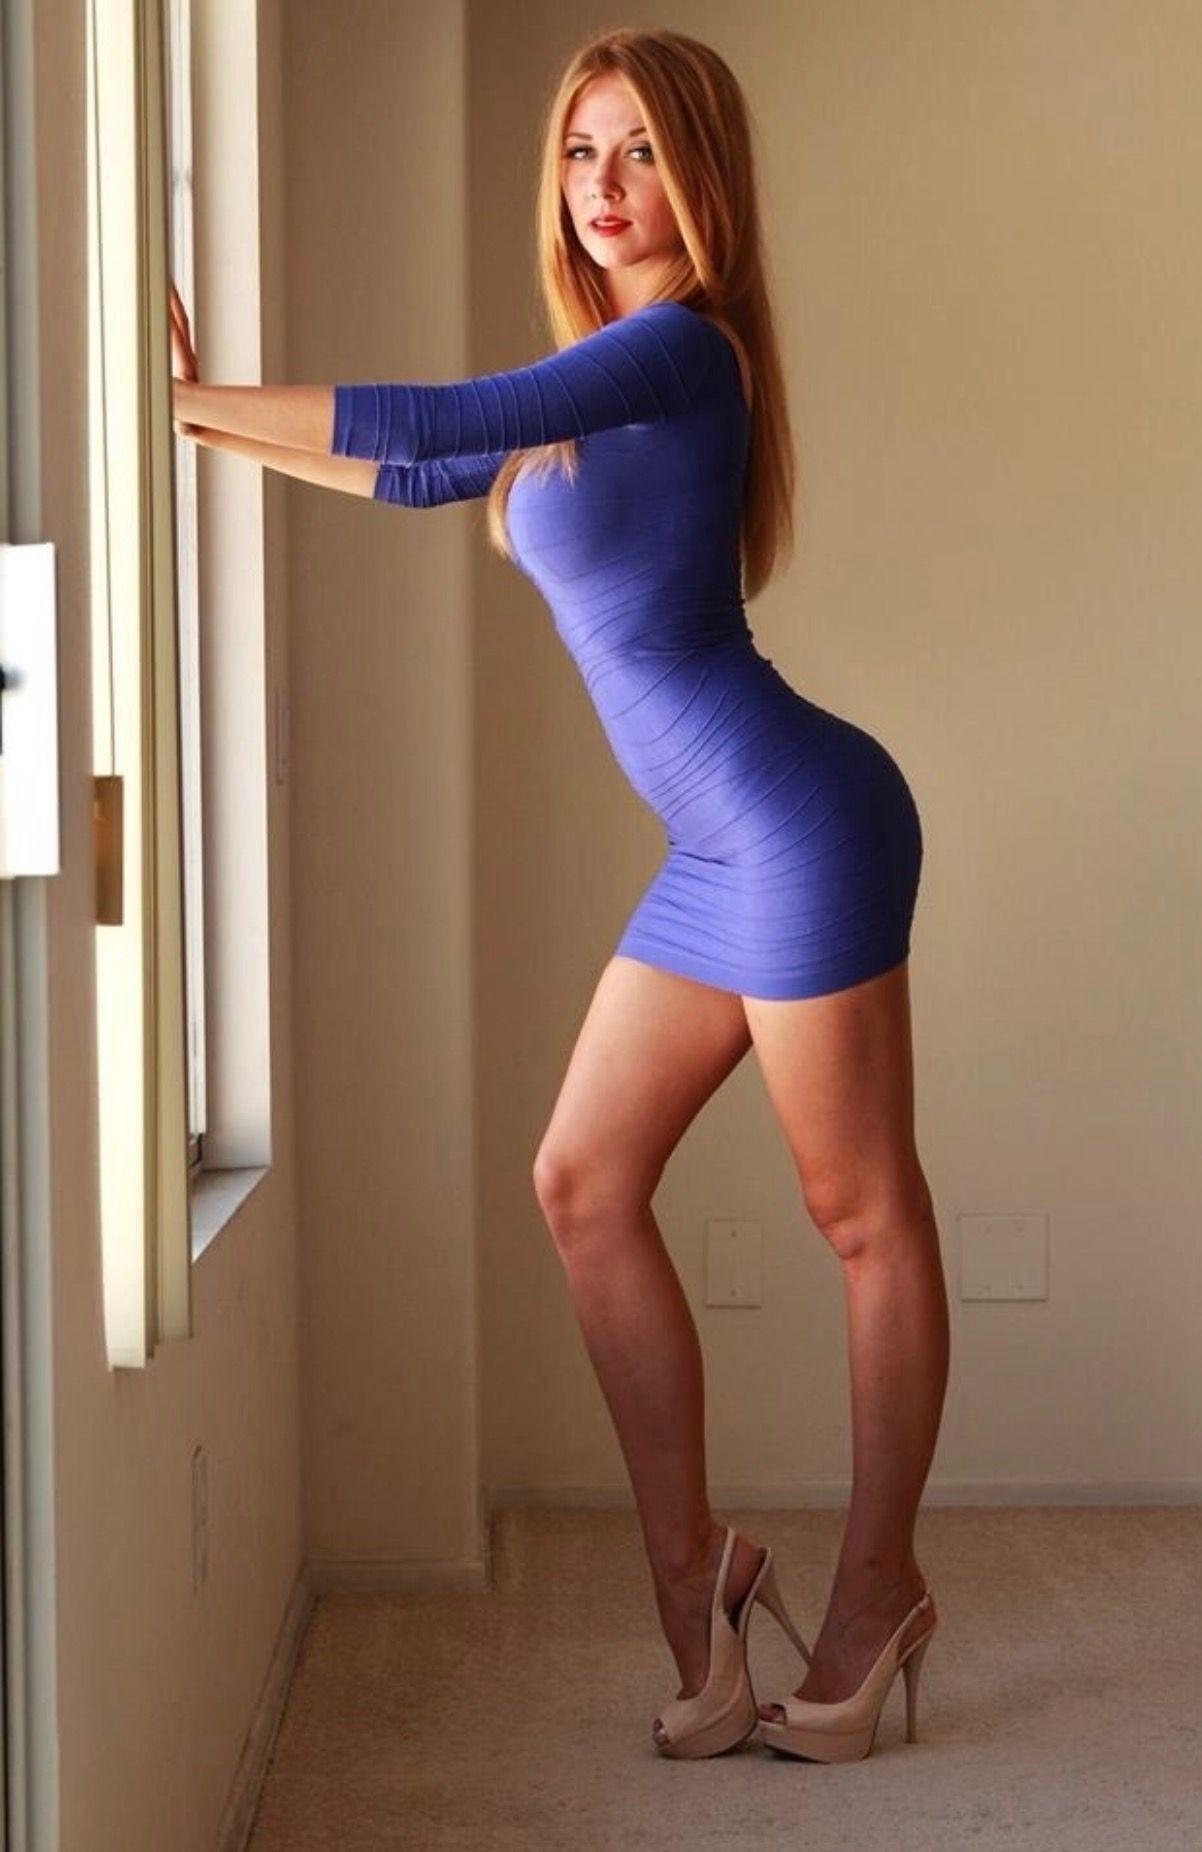 Pin on hot woman